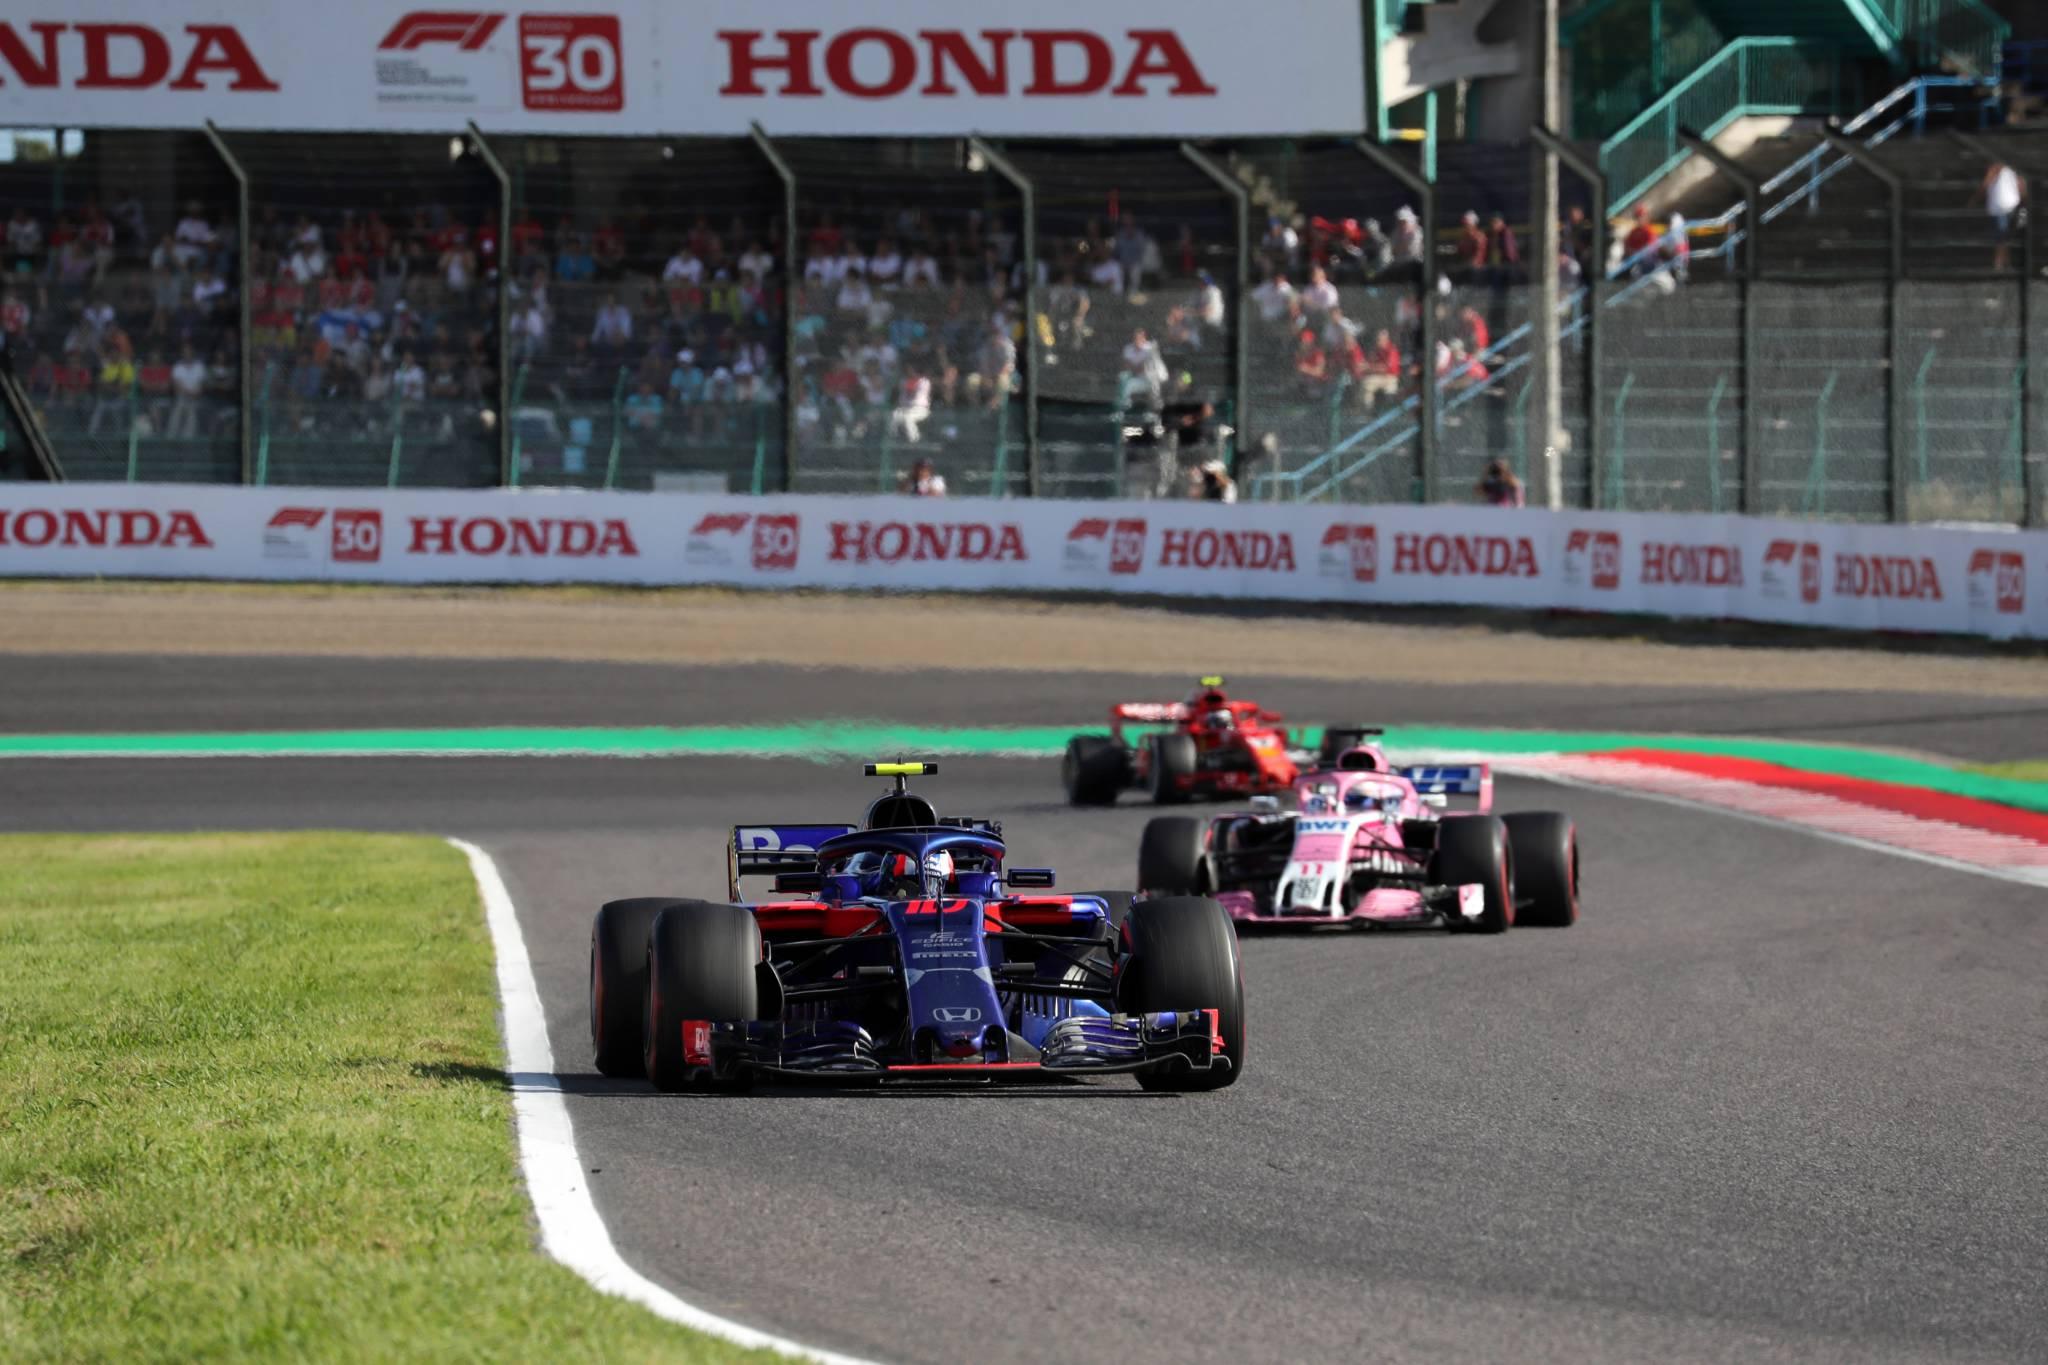 07.10.2018 - Race, Pierre Gasly (FRA) Scuderia Toro Rosso STR13